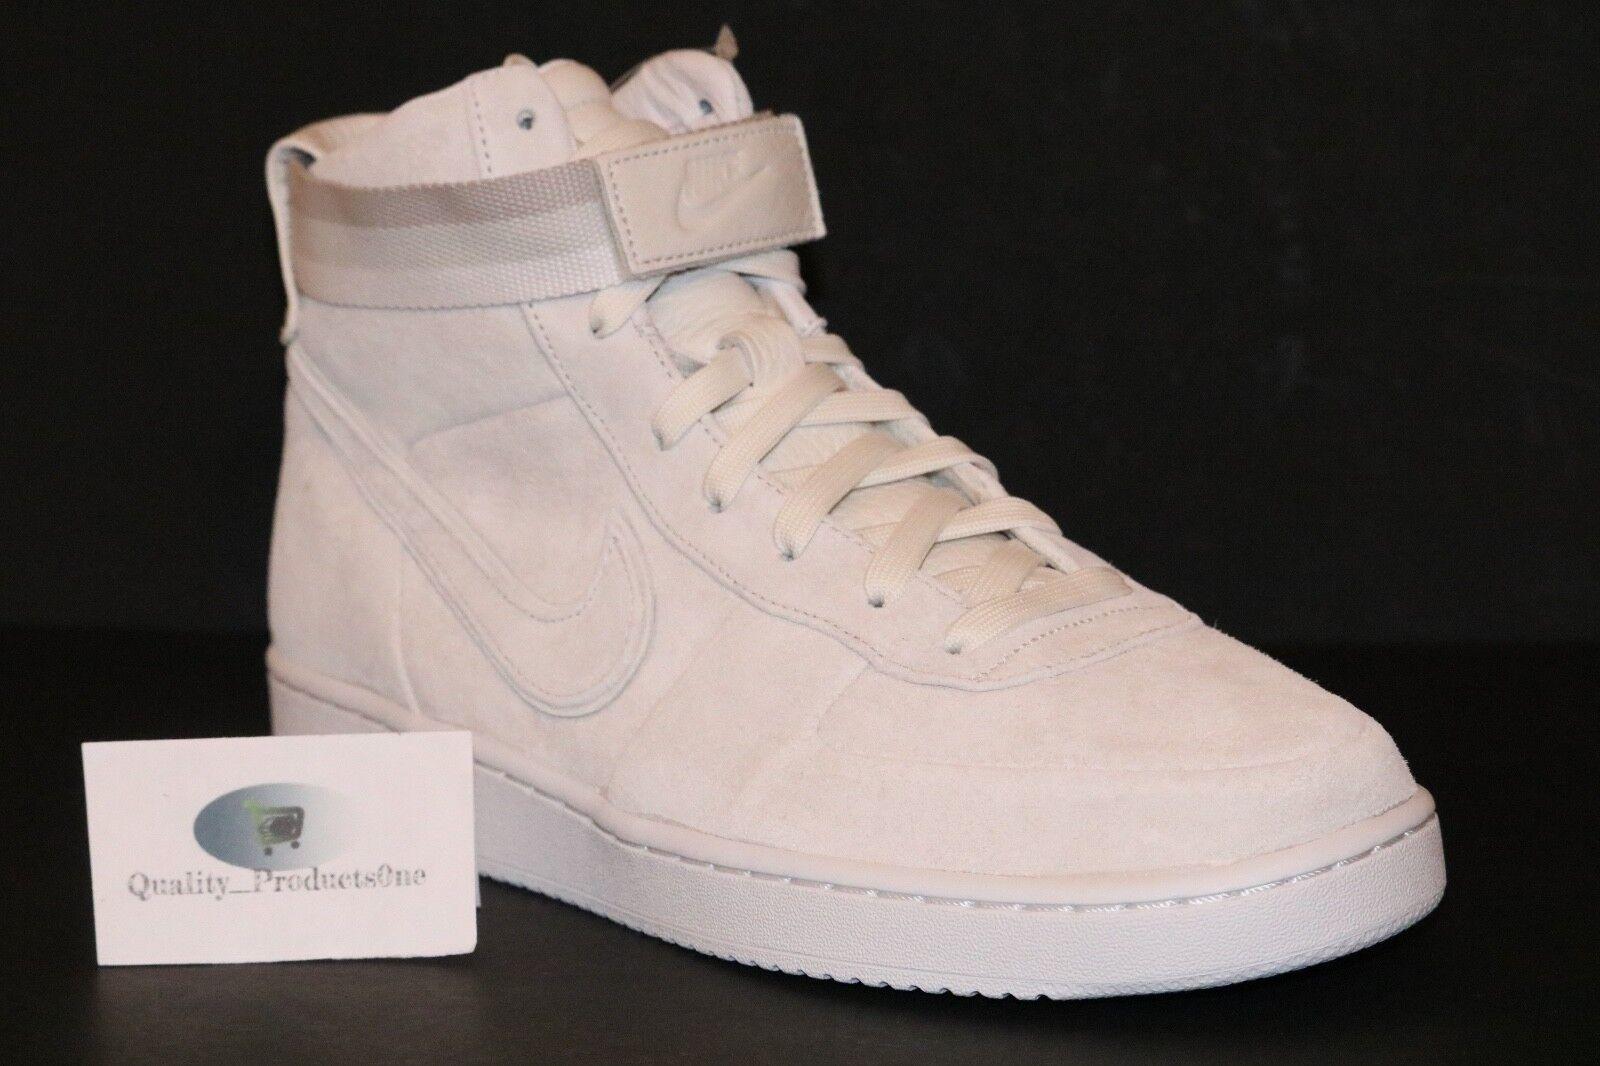 Nike Vandal High Premium John Elliott Sail White AH7171 101 Size 9.5-11